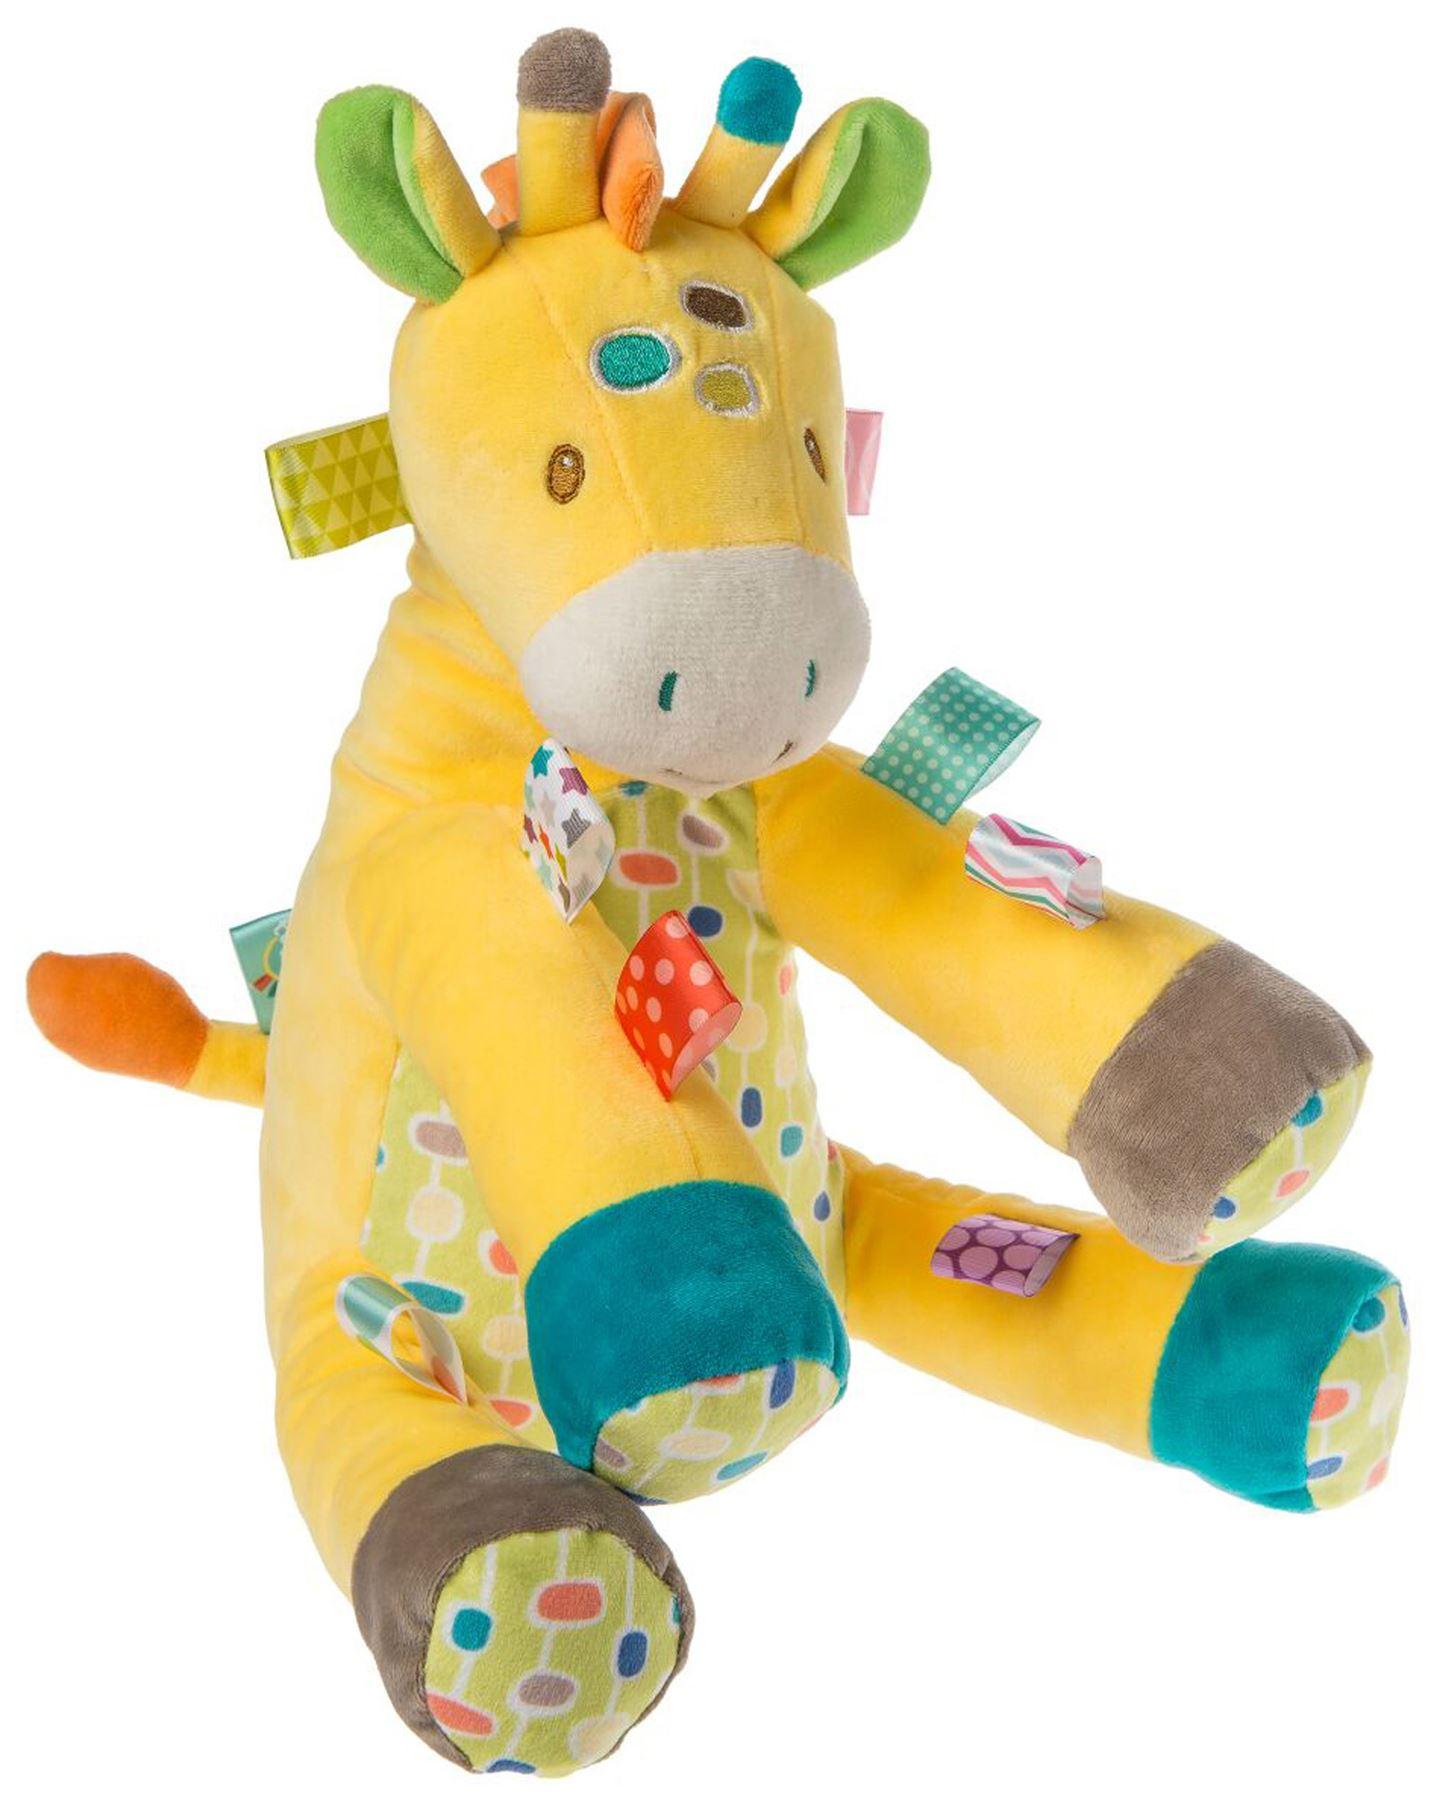 taggies gumdrops giraffe soft toy baby comforter soft toys activities bn 719771402257 ebay. Black Bedroom Furniture Sets. Home Design Ideas